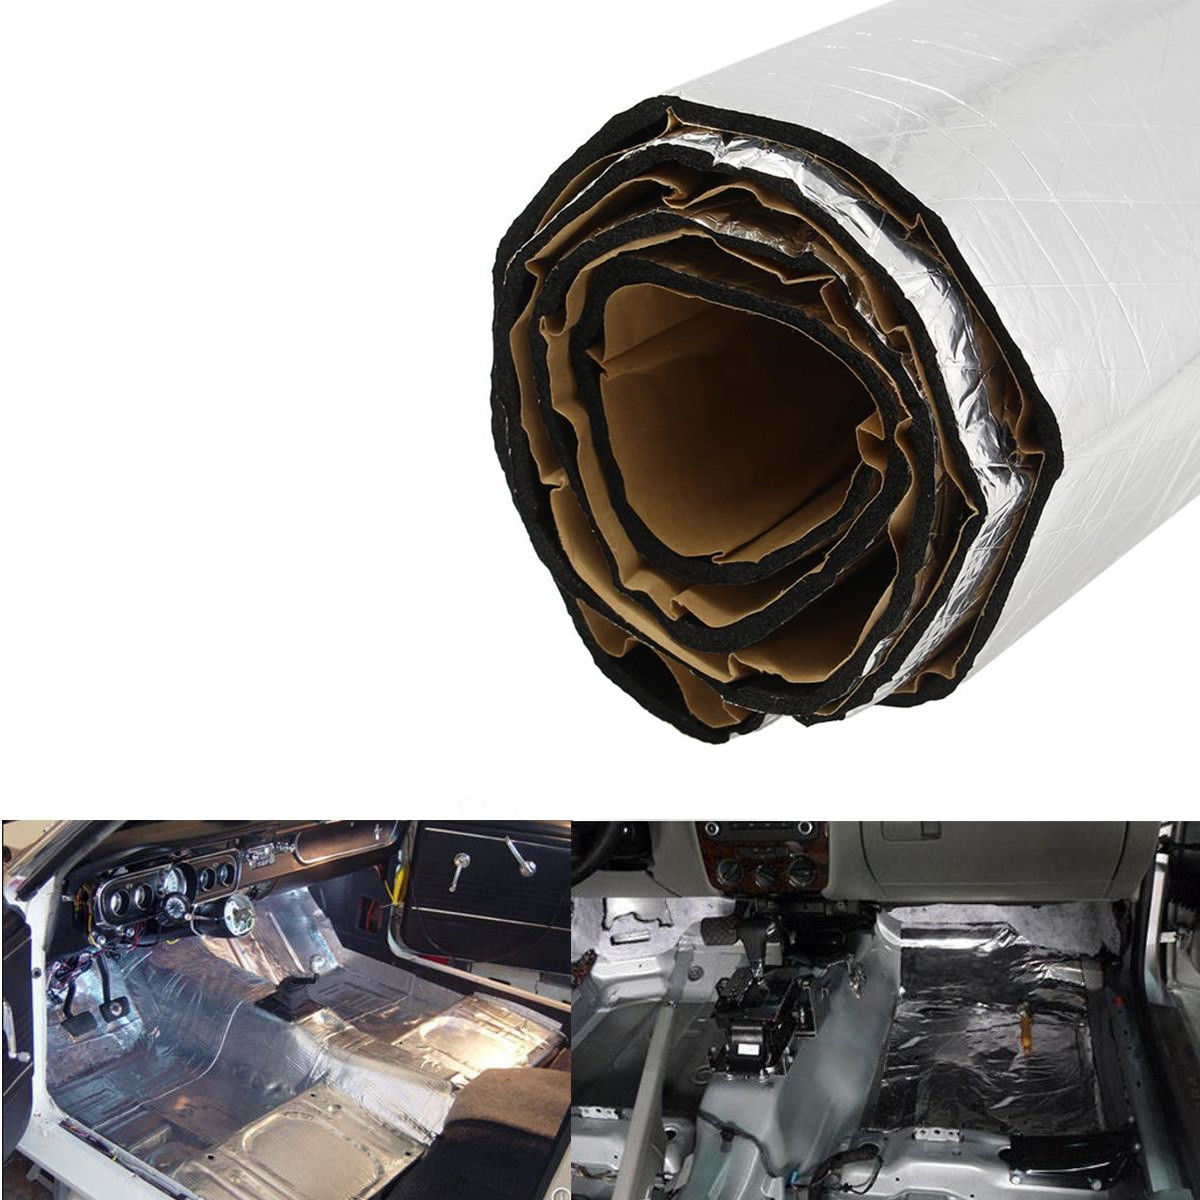 100x250 cm voiture bruit Deadener tapis feuille bouclier Deadener isolation tapis aluminium coton voiture-style